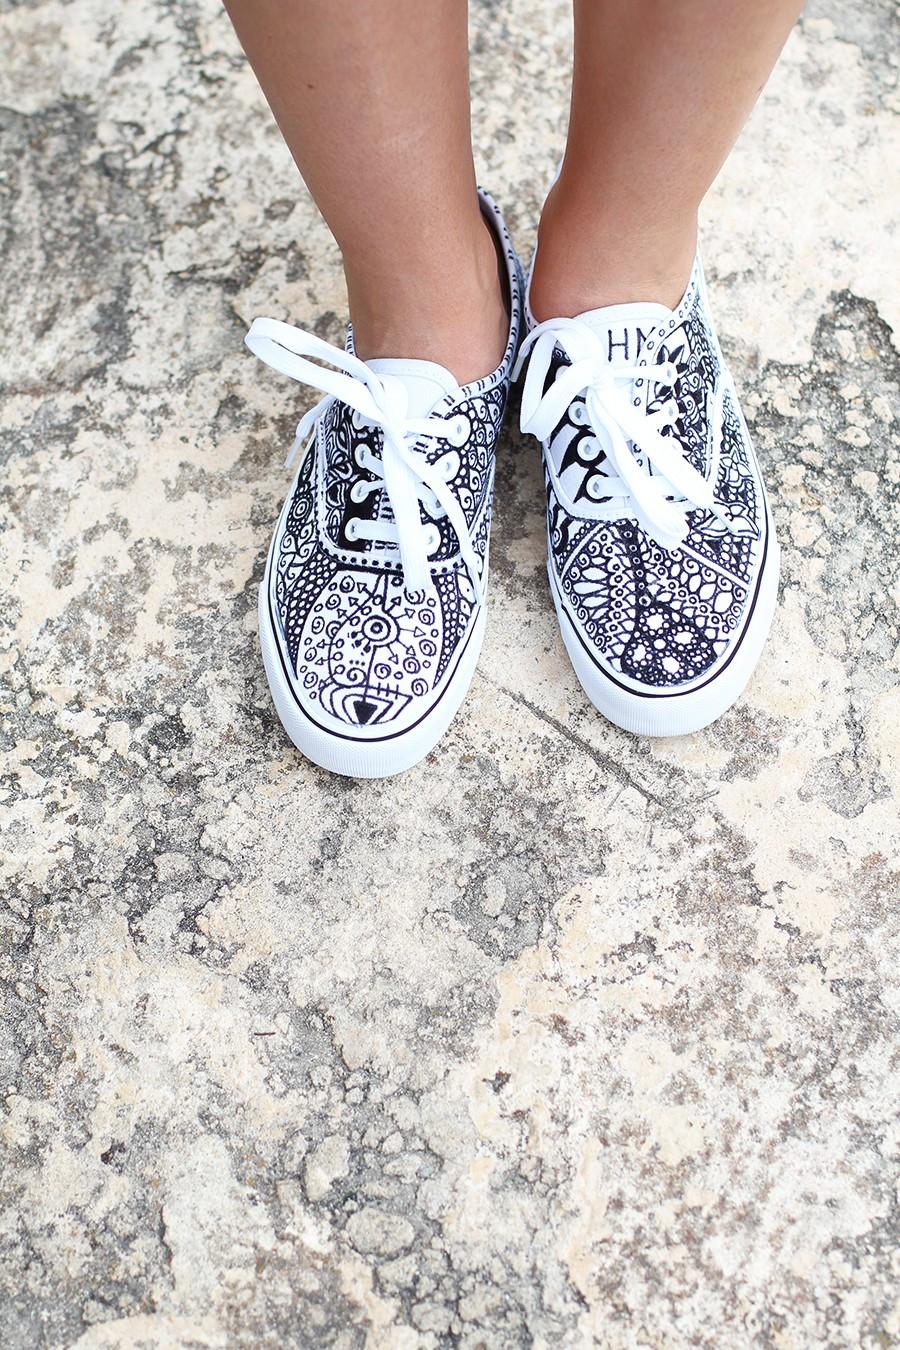 customized-diy-shoes